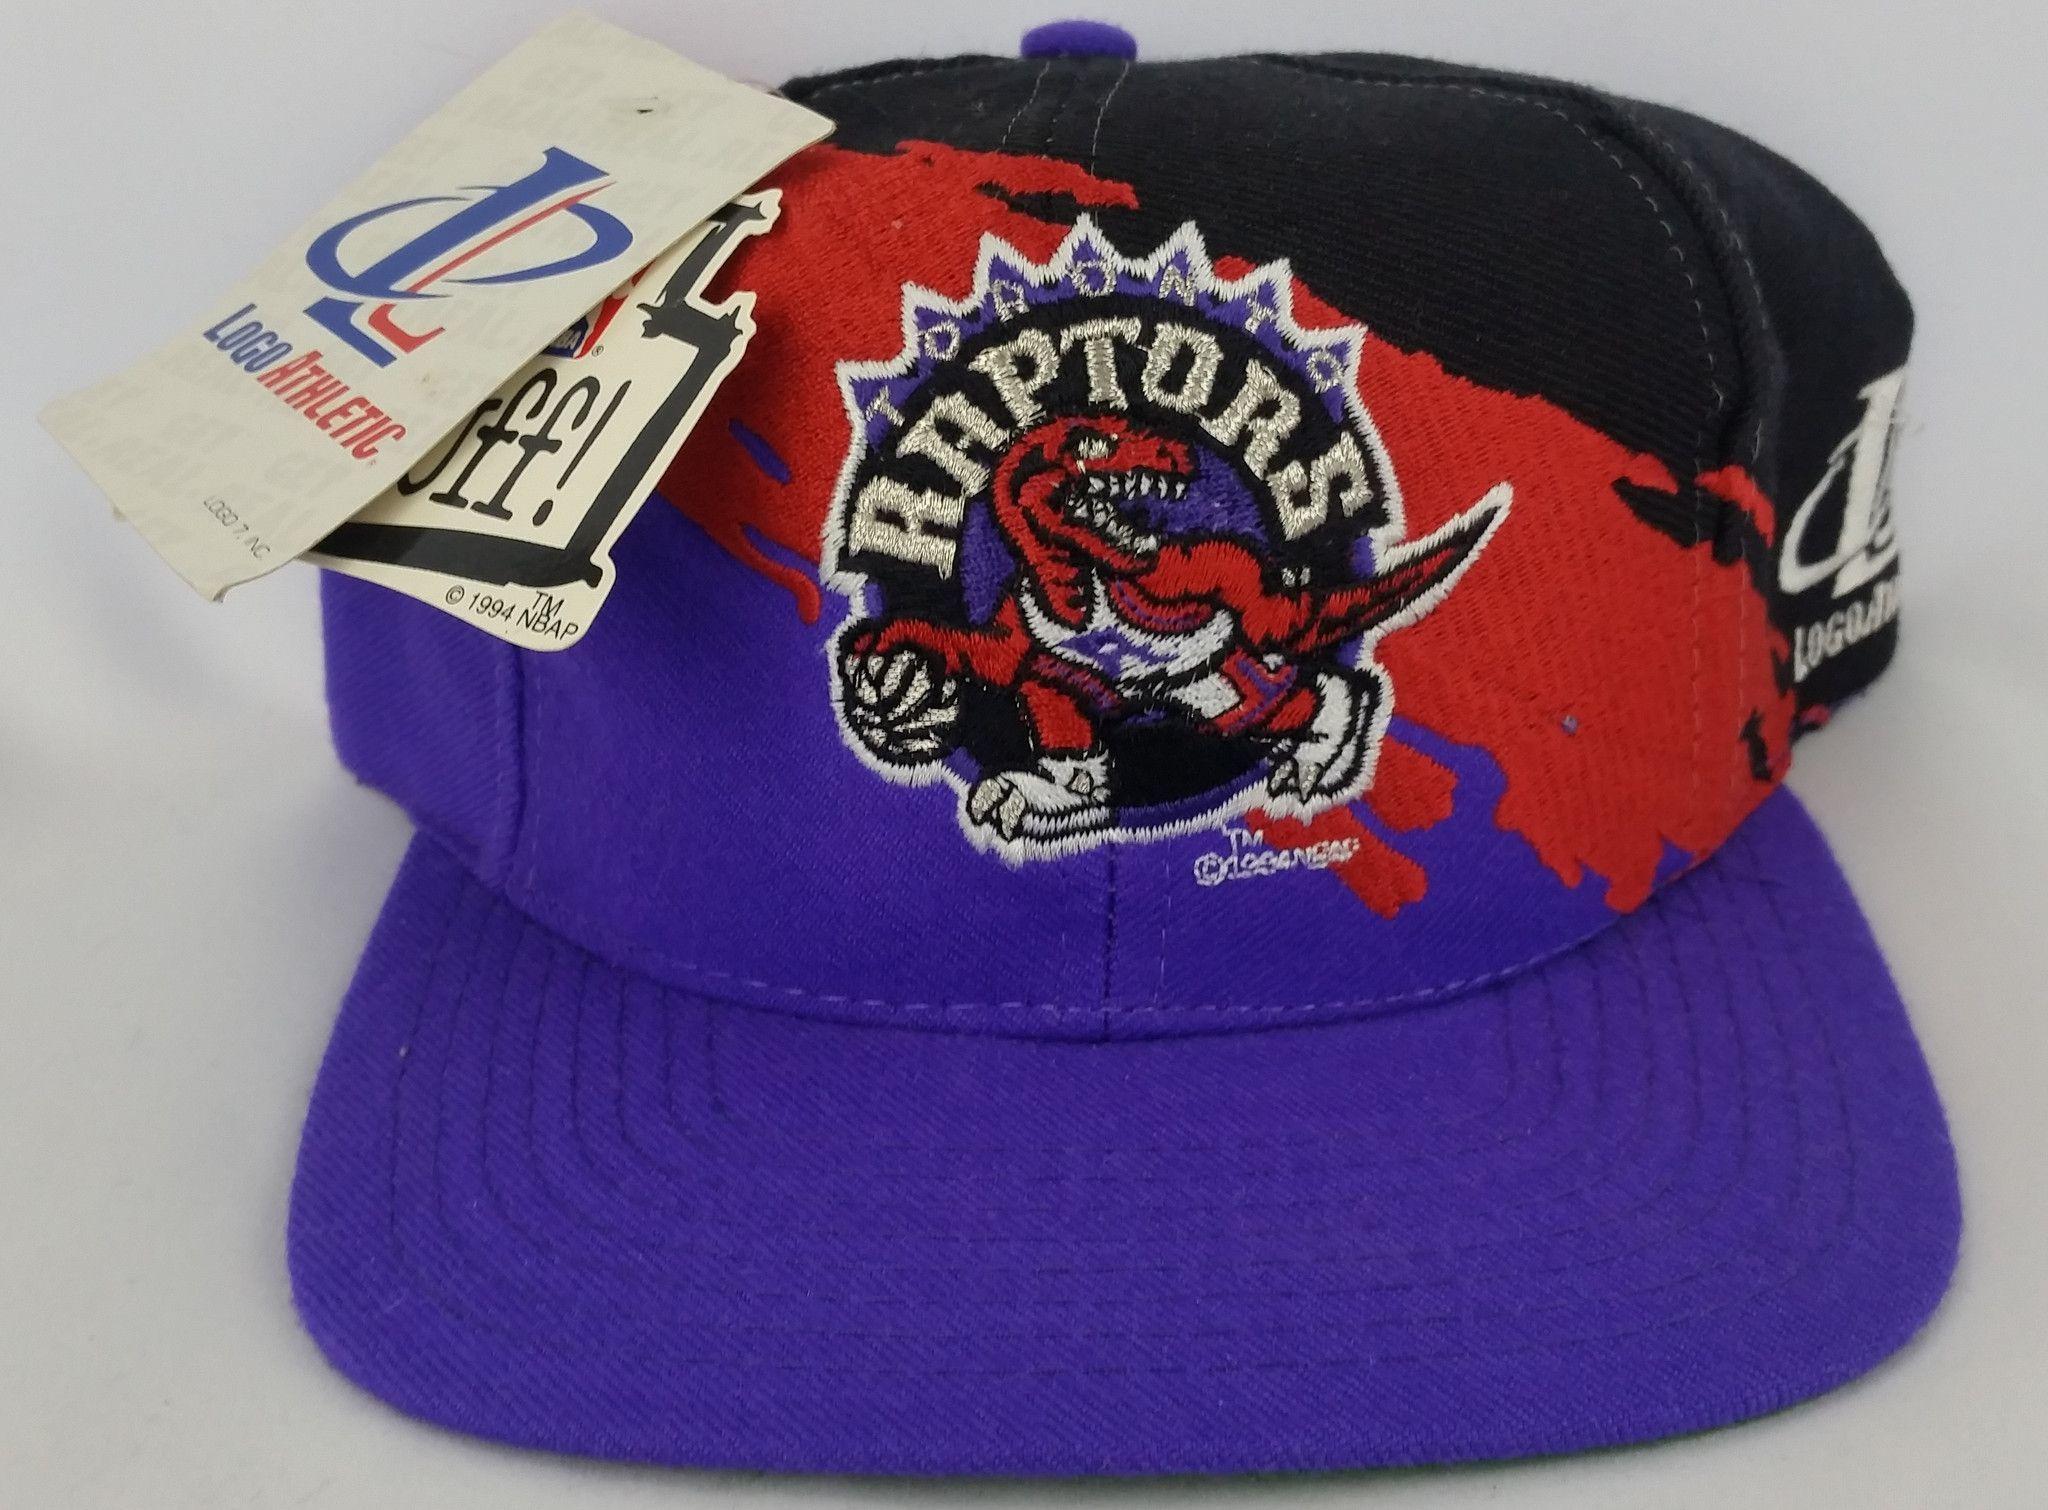 Toronto Raptors Vintage Snapback Logo Athletic Splash Hat NBA Cap Rare NWT 72efcad4d